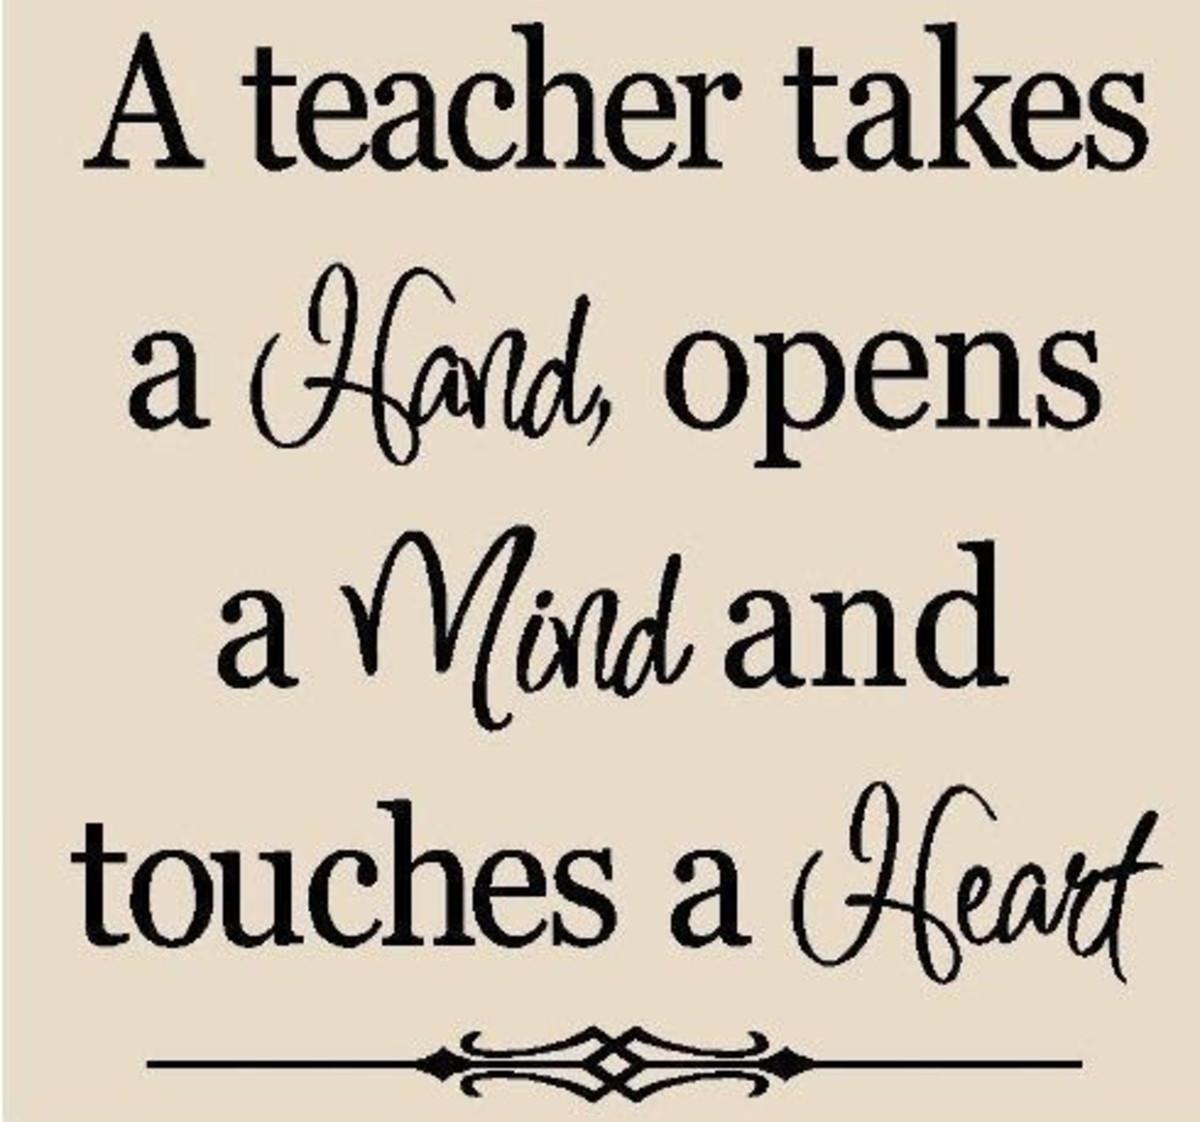 to-teach-or-not-to-teach-ronas-teaching-journey